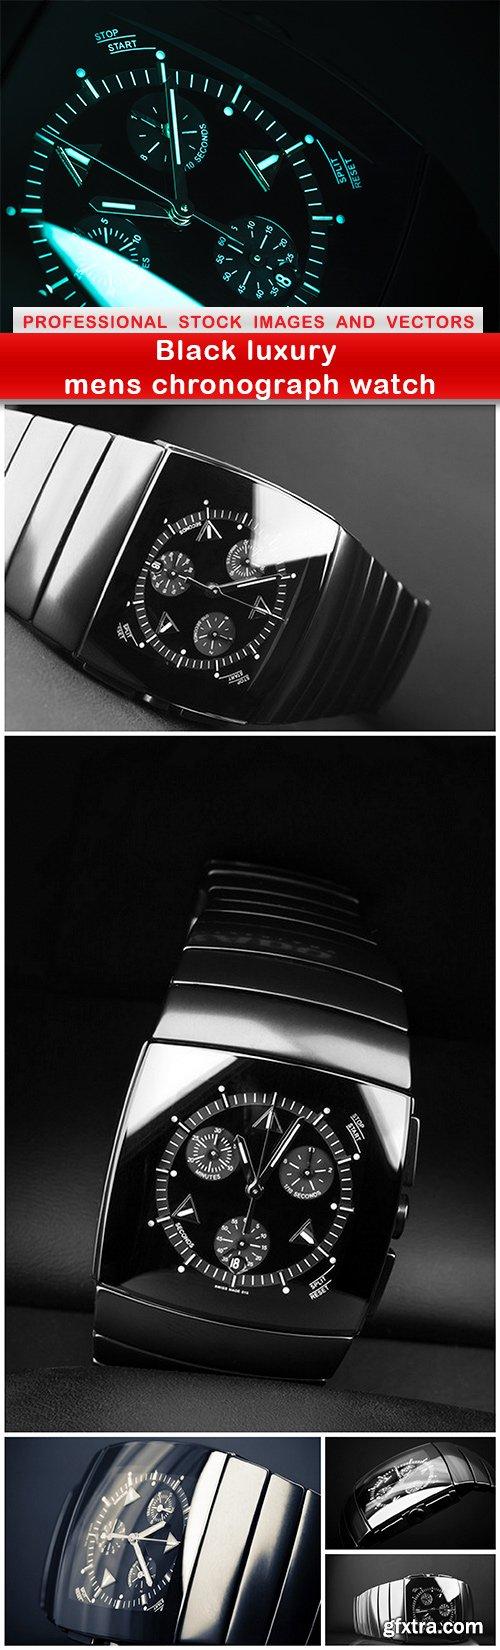 Black luxury mens chronograph watch - 6 UHQ JPEG